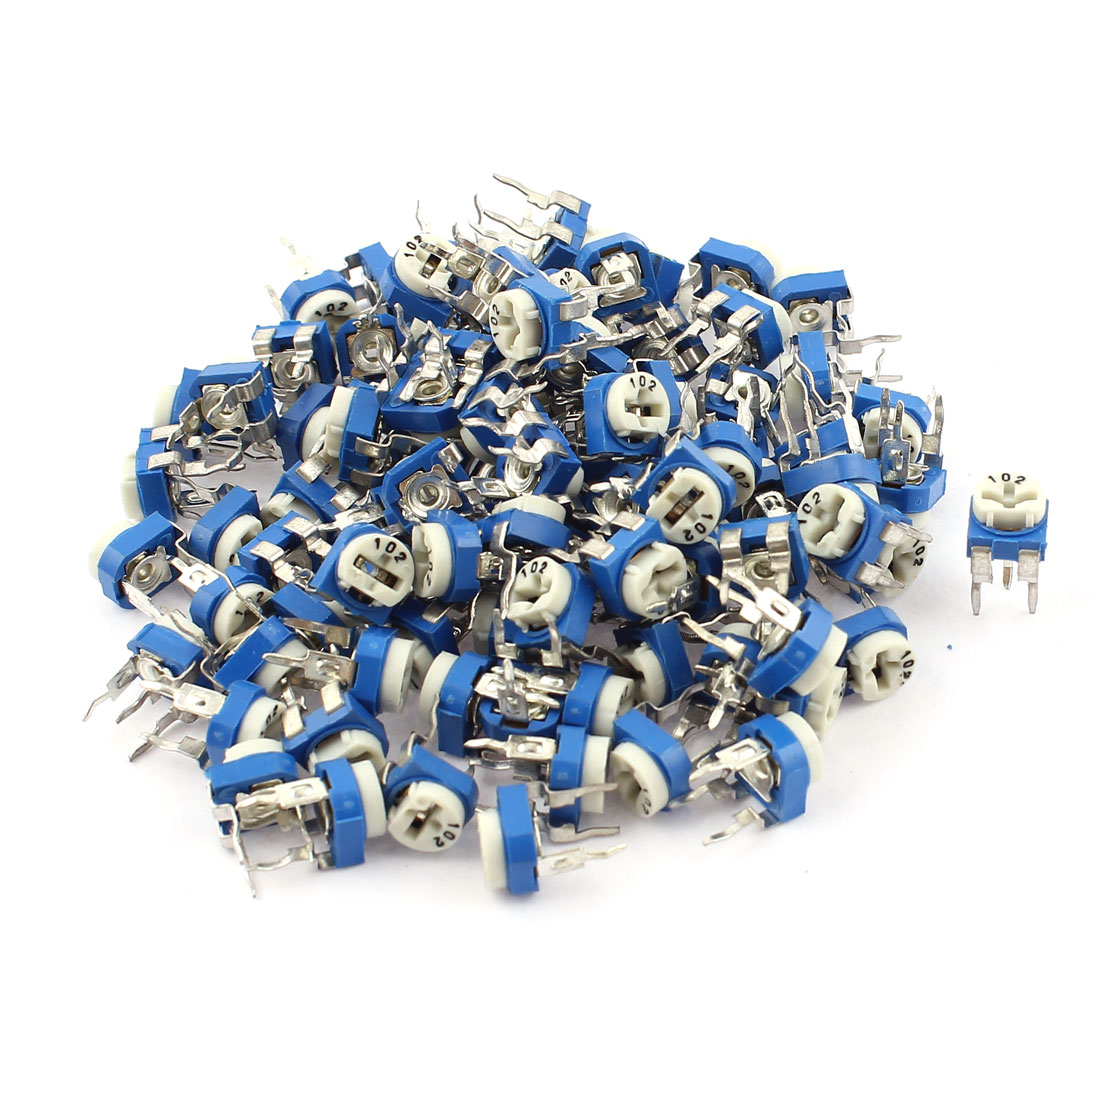 100Pcs 1K ohm Vertical PCB Preset Variable Resistor Trimmer Potentiometer Blue